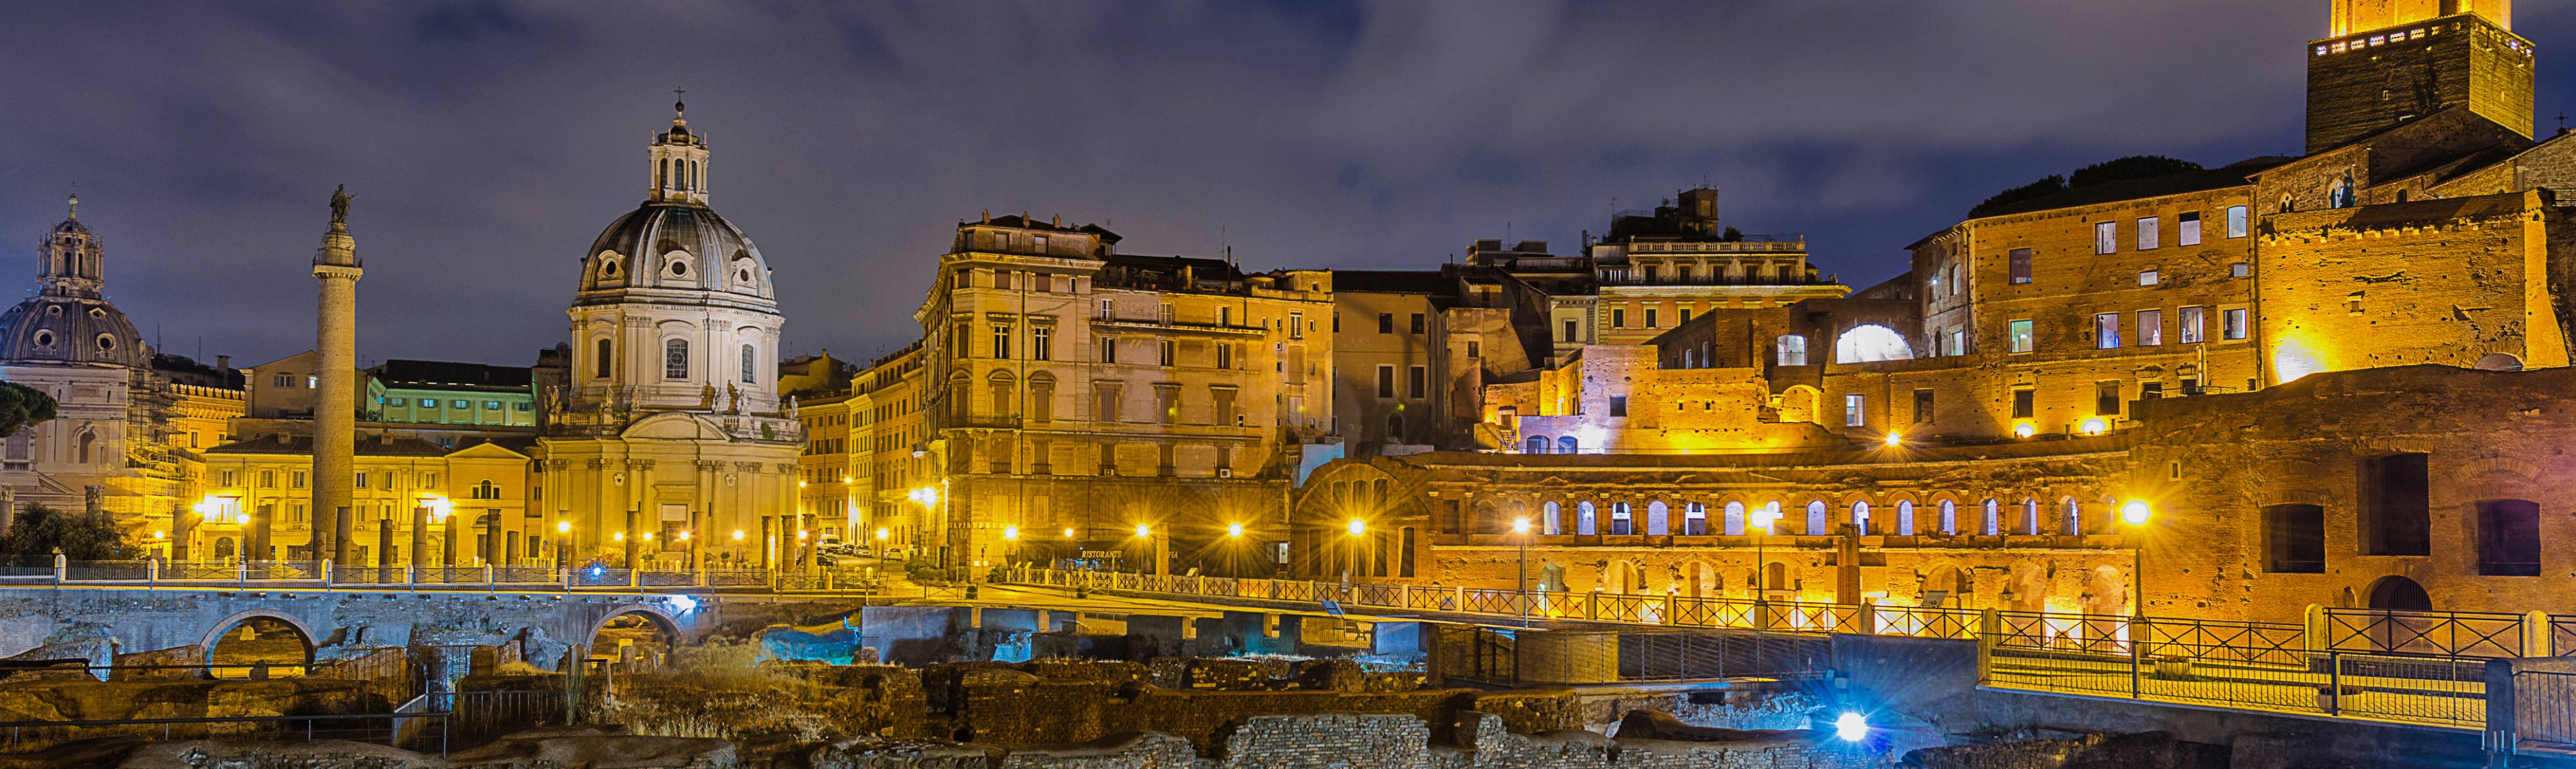 Illuminated view of the ancient Roman Forum